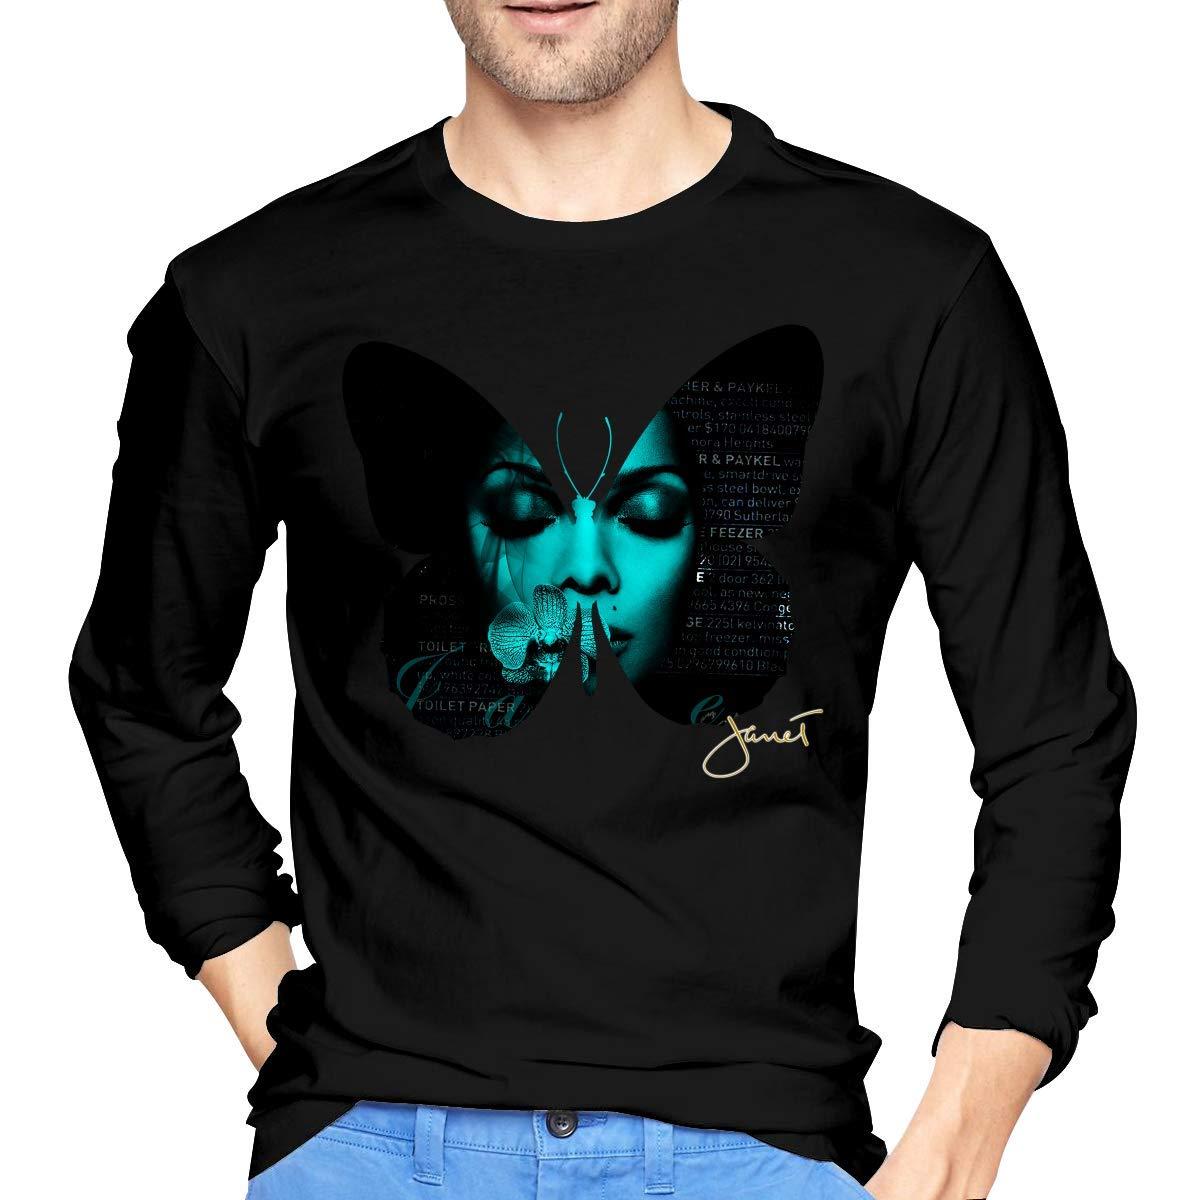 Fssatung S Janet Jackson T Shirts Black